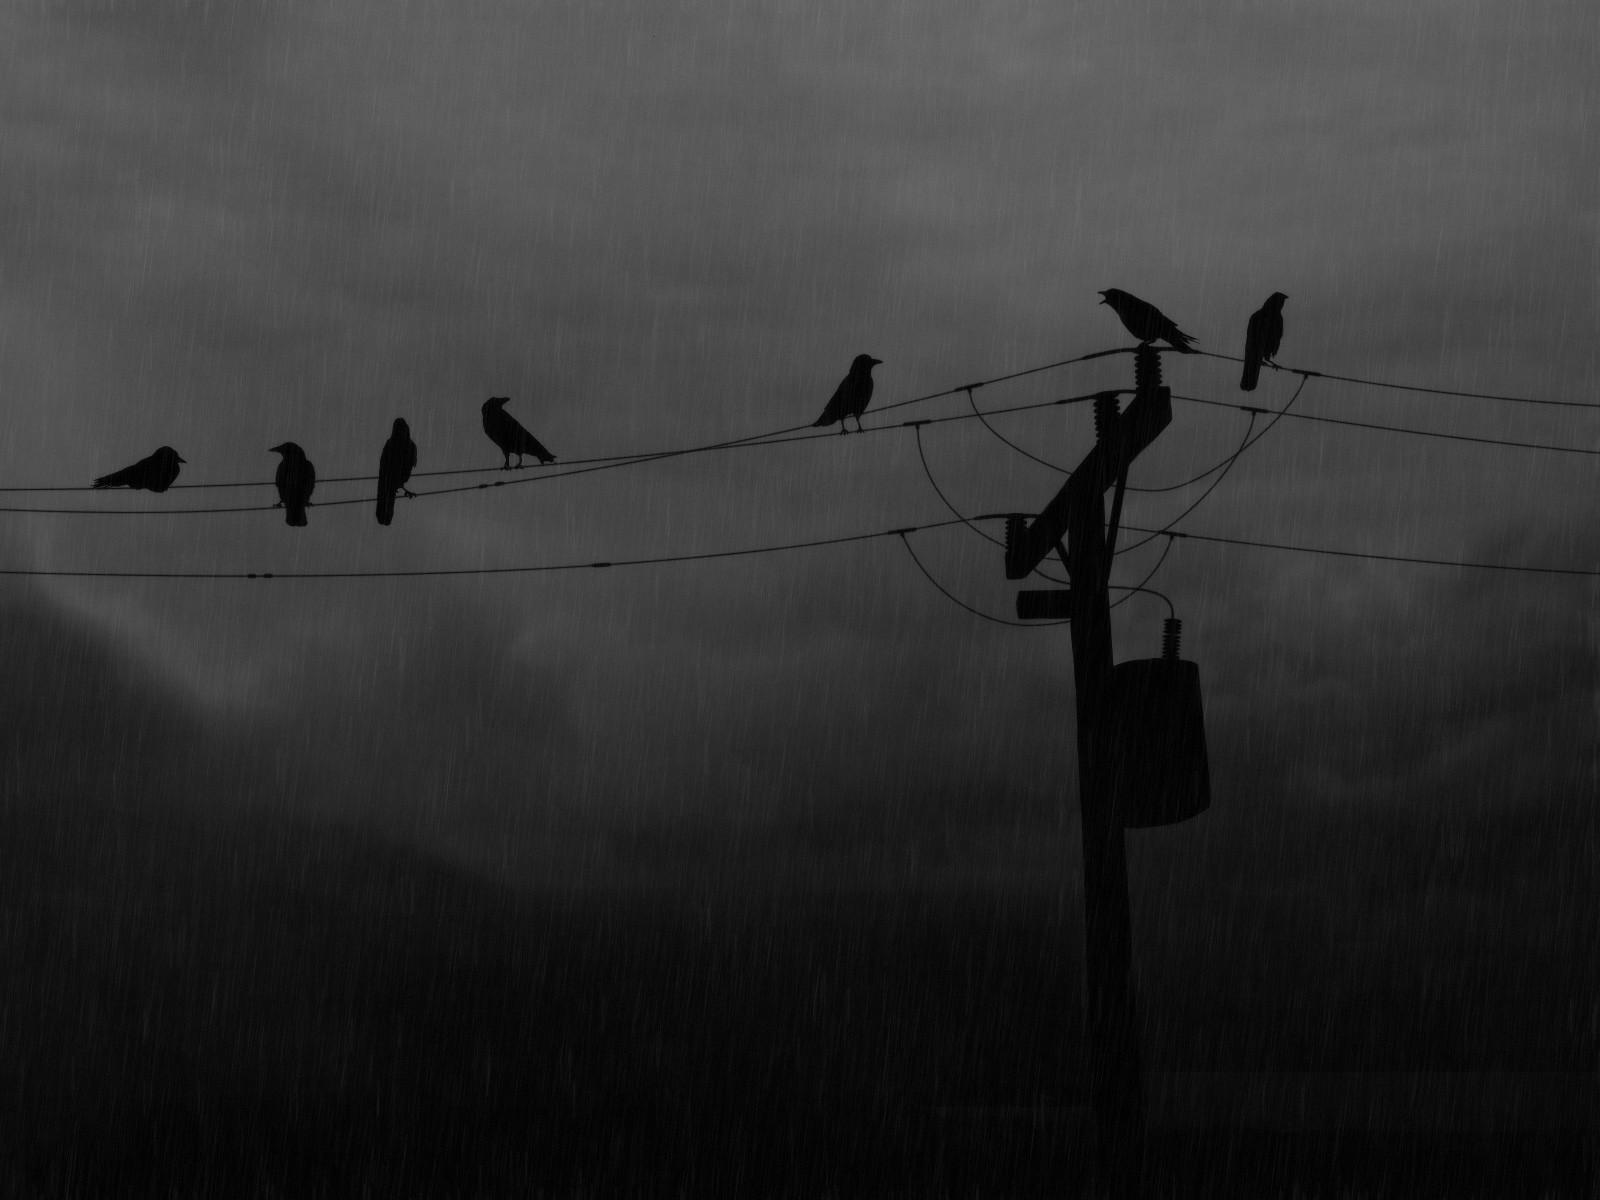 Wallpaper Birds Rain Silhouette Morning Wind Fence Utility